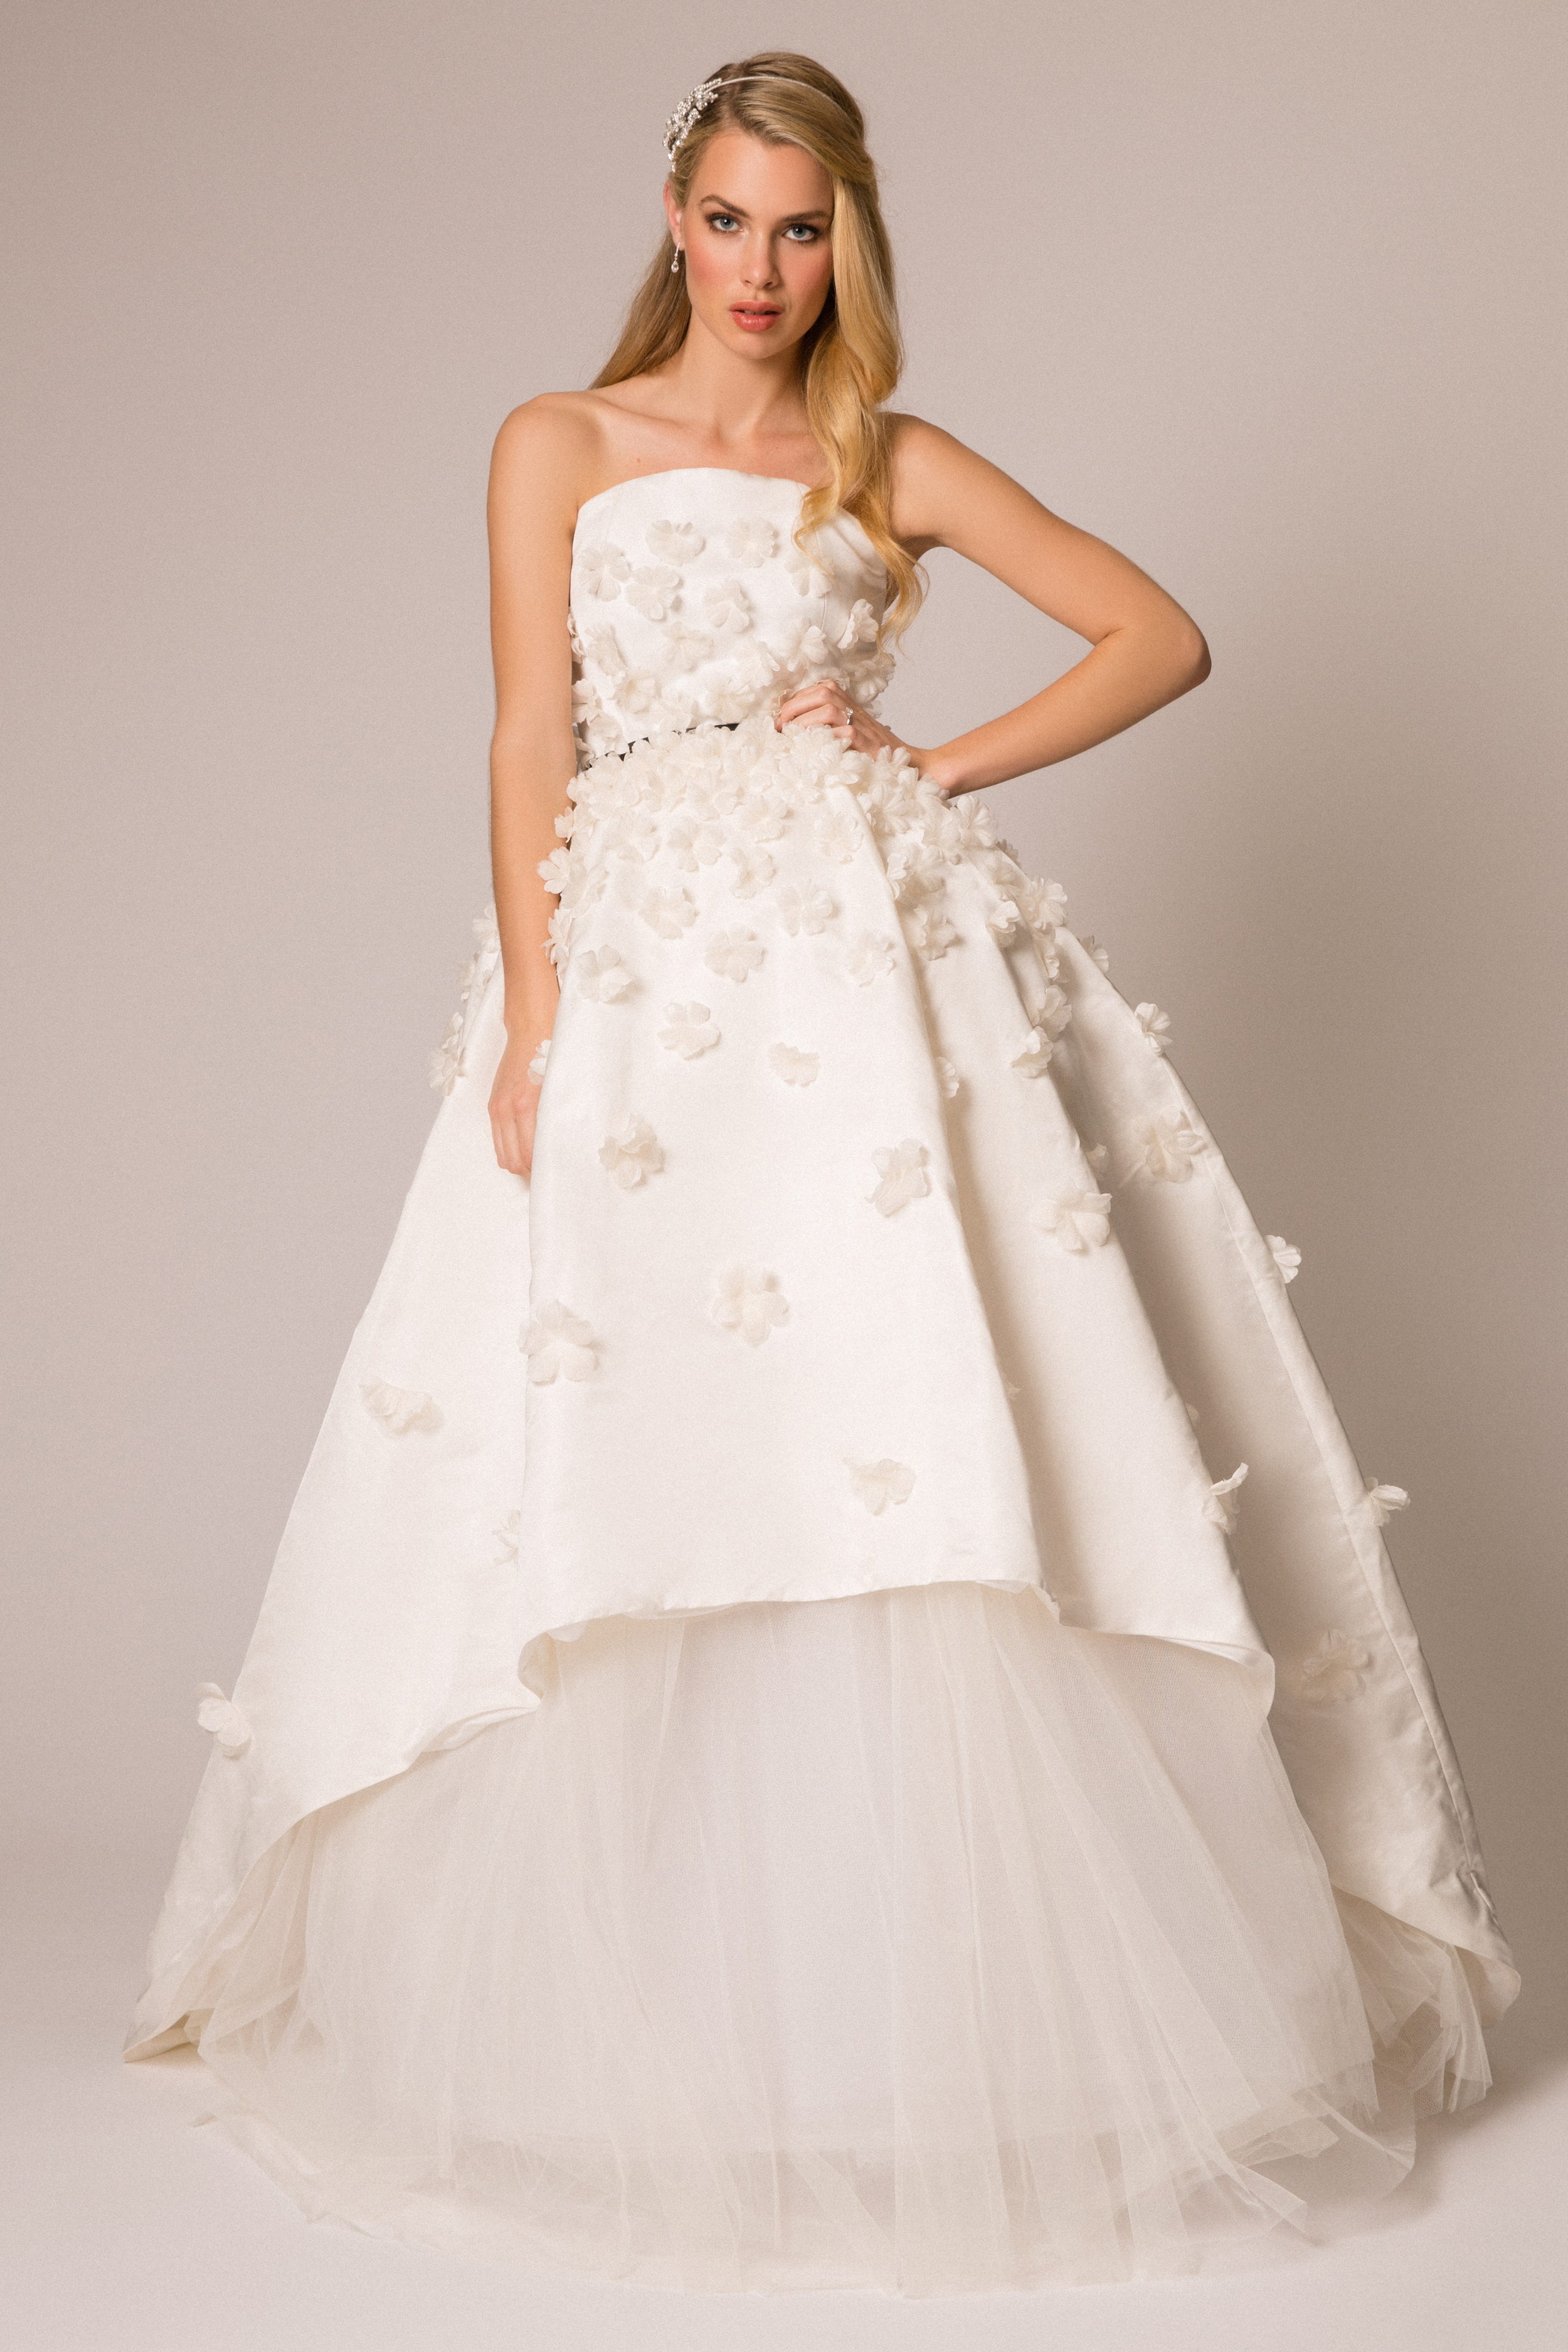 The Castalia Dress